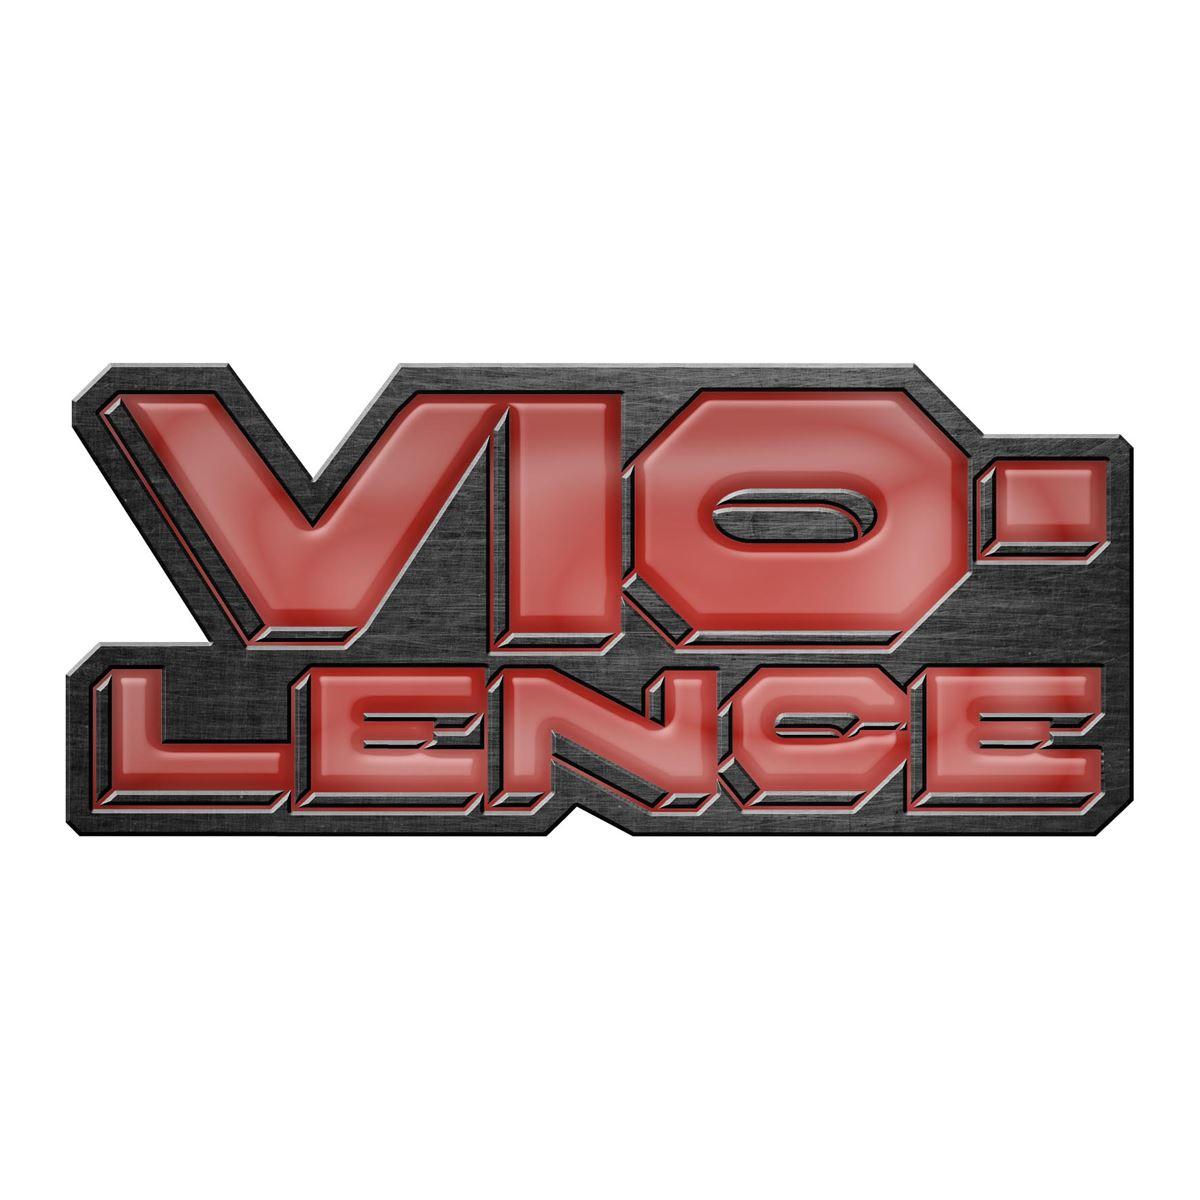 VIO-LENCE - LOGO Metal Pin